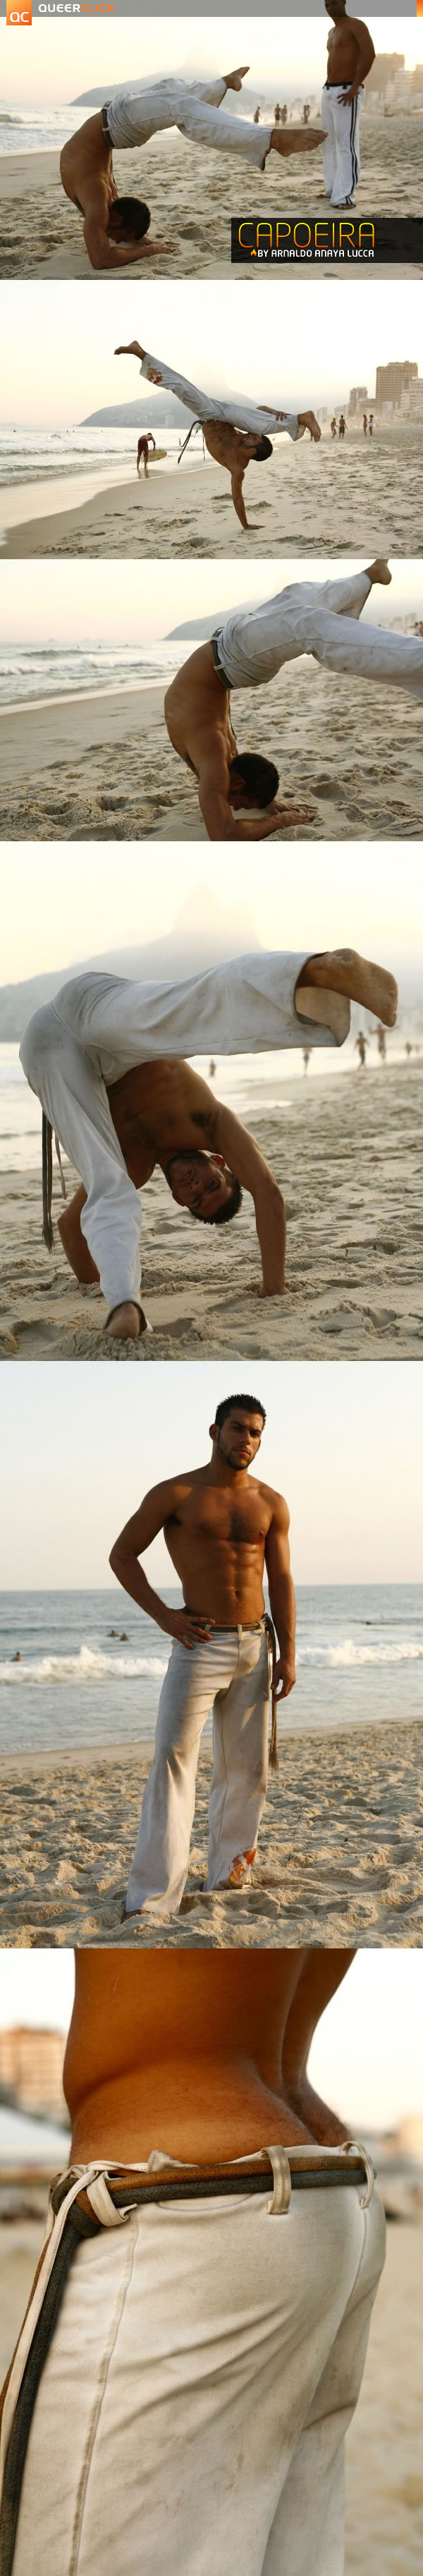 fo_capoeira_aal_bqce.jpg